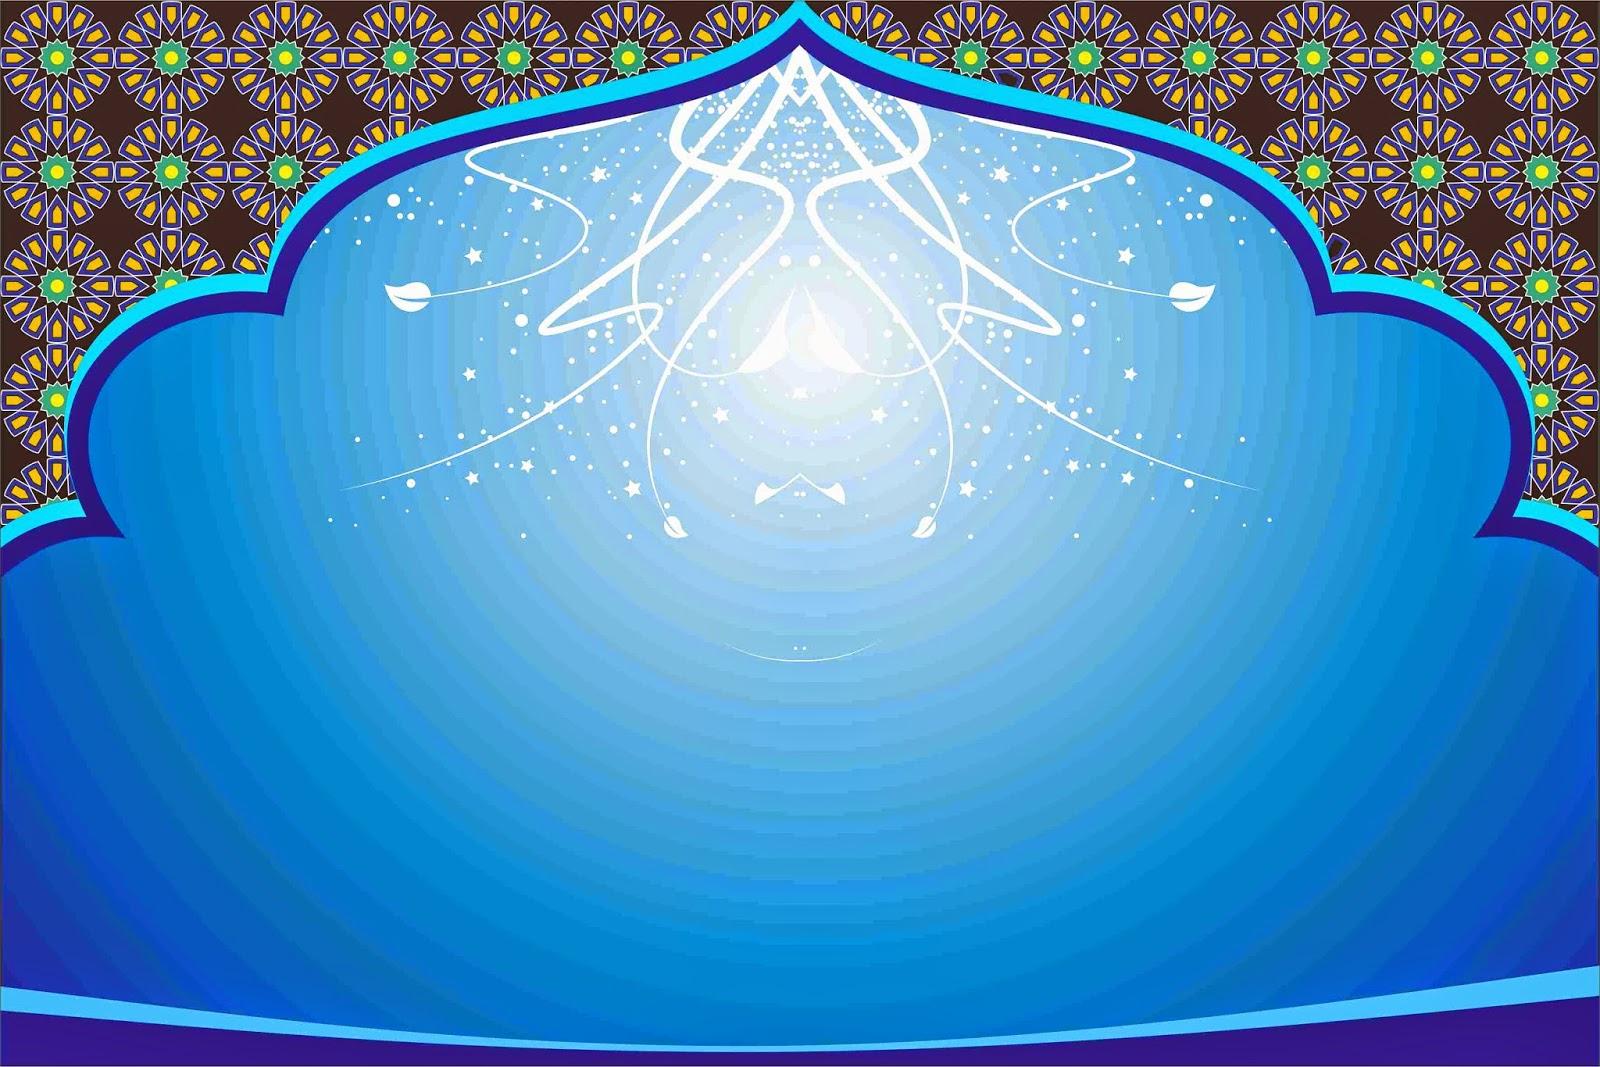 Desain Panggung Dan Tema Maulid Nabi Muhammad Saw